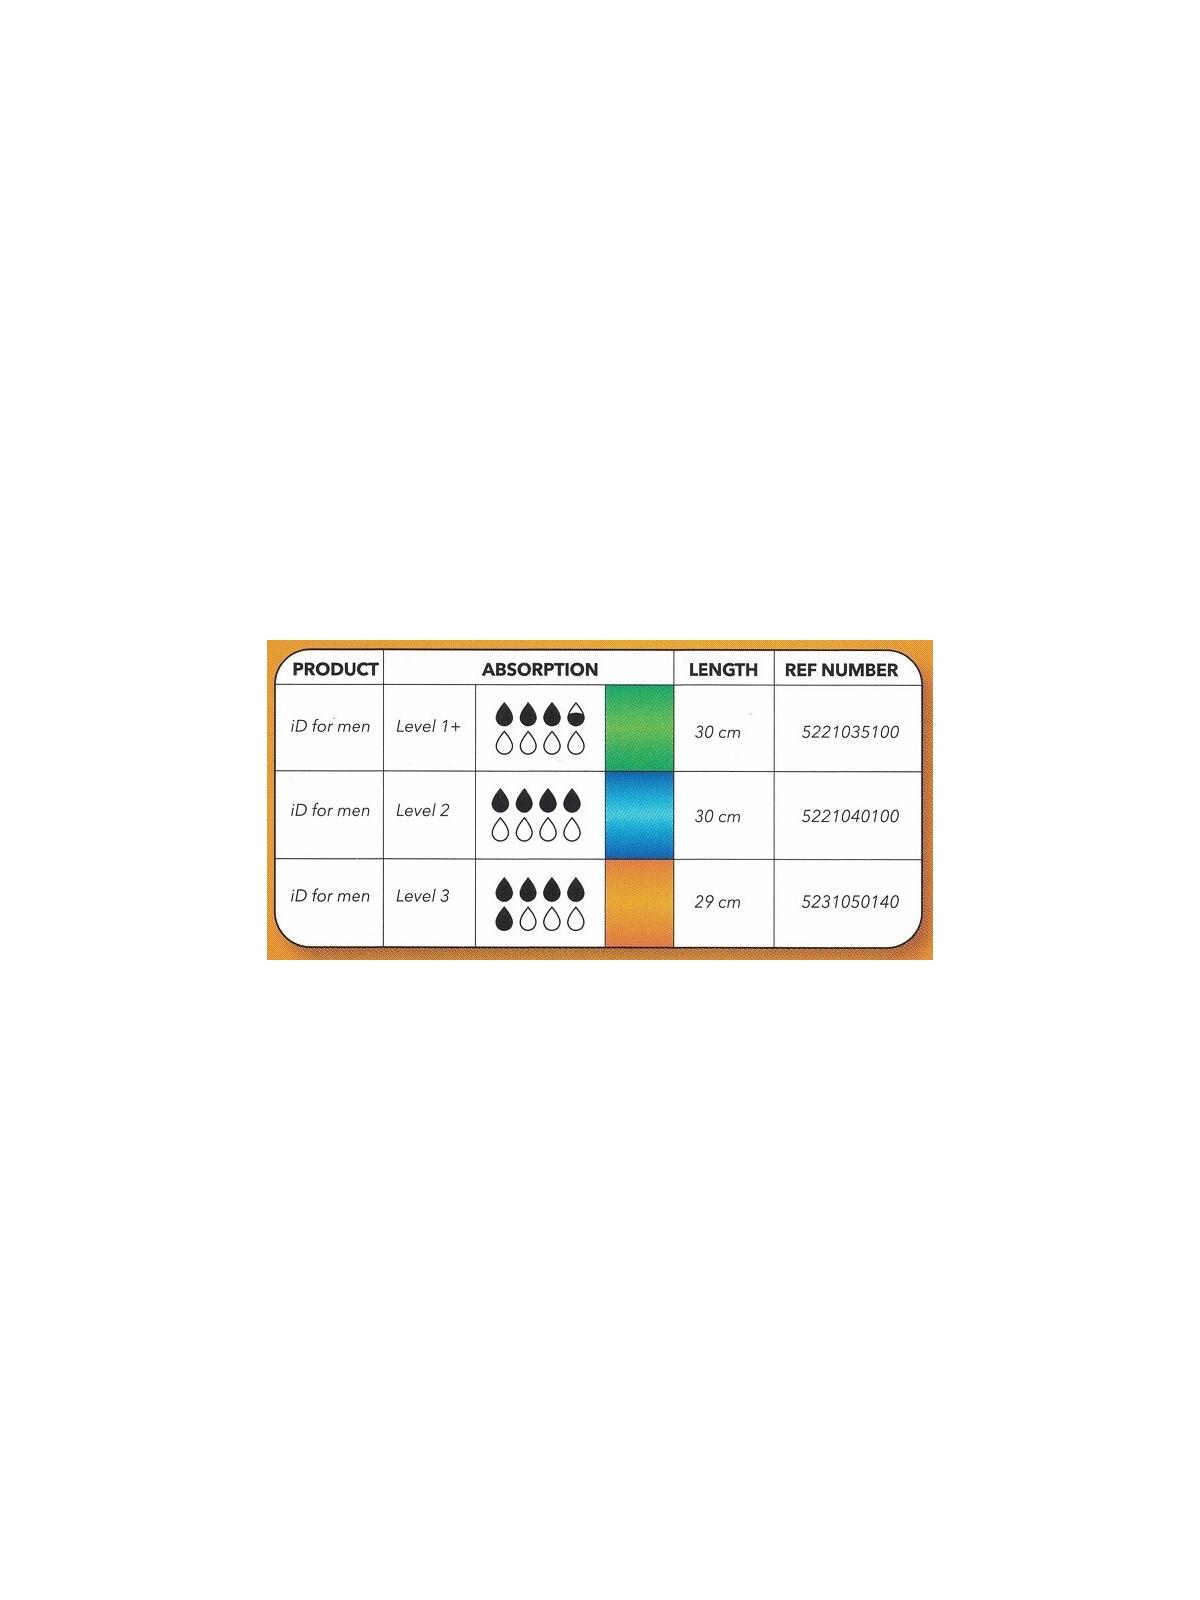 Compresa ID For men masculina Level 3 máxima absorcion- 14und/bolsa -12bolsas/caja